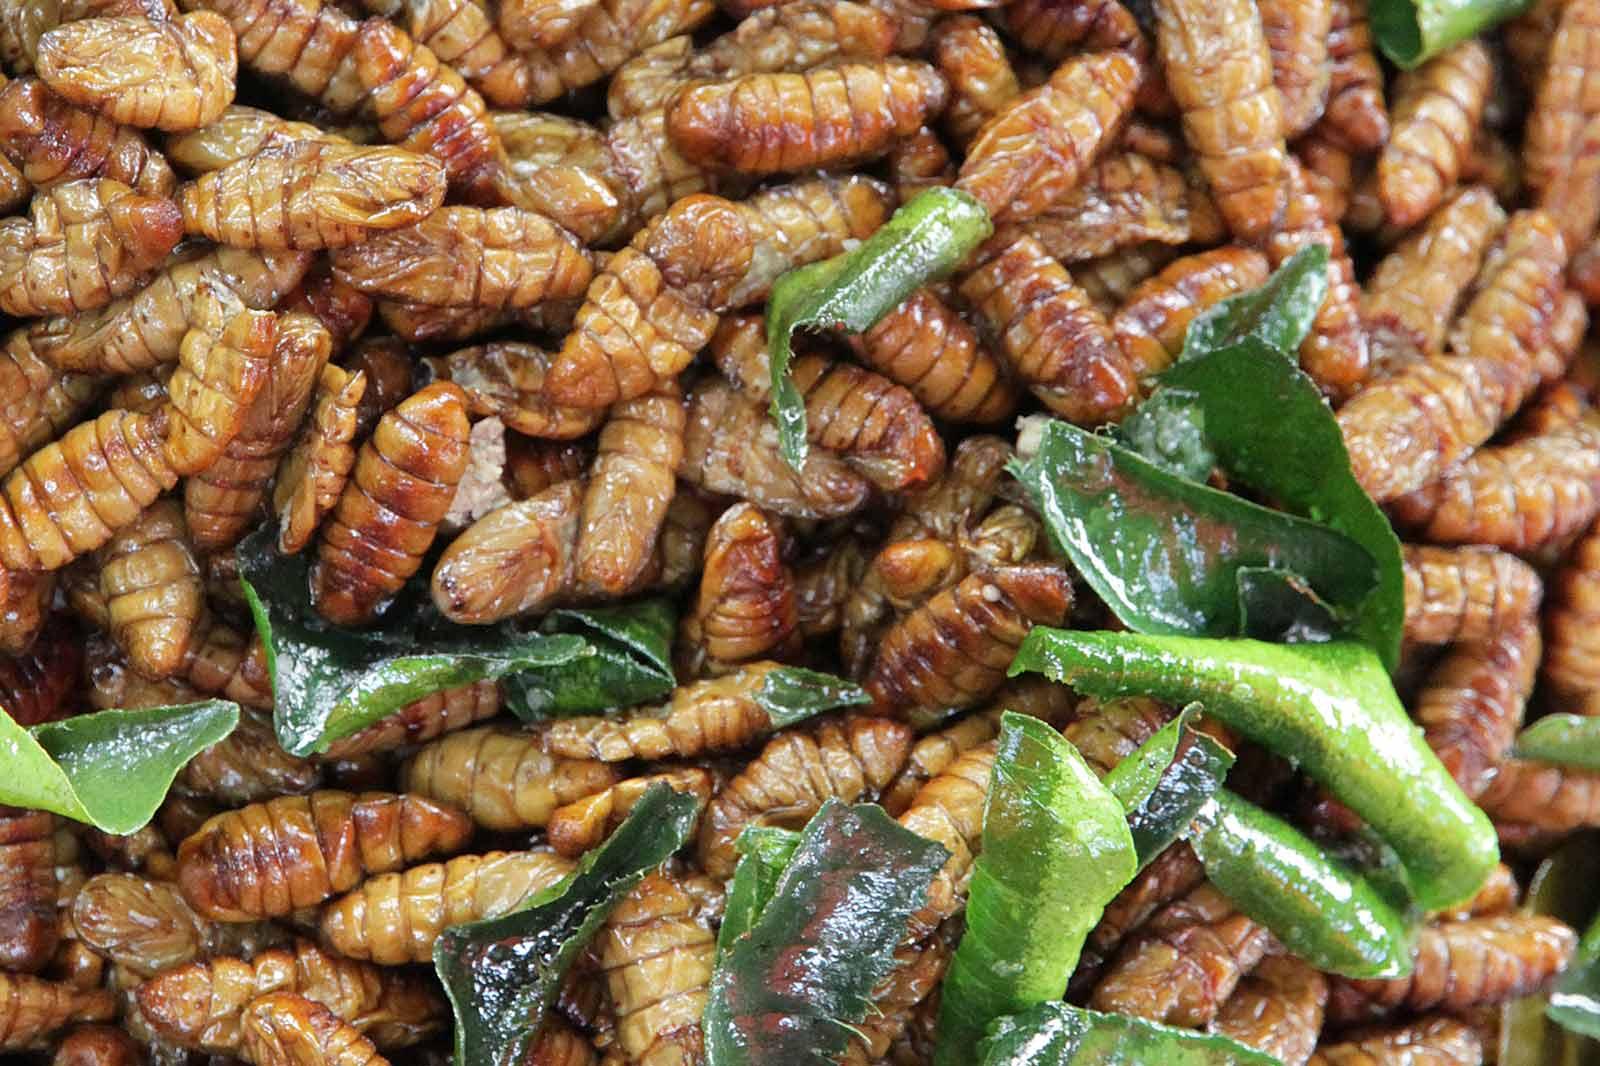 Fried maggots.